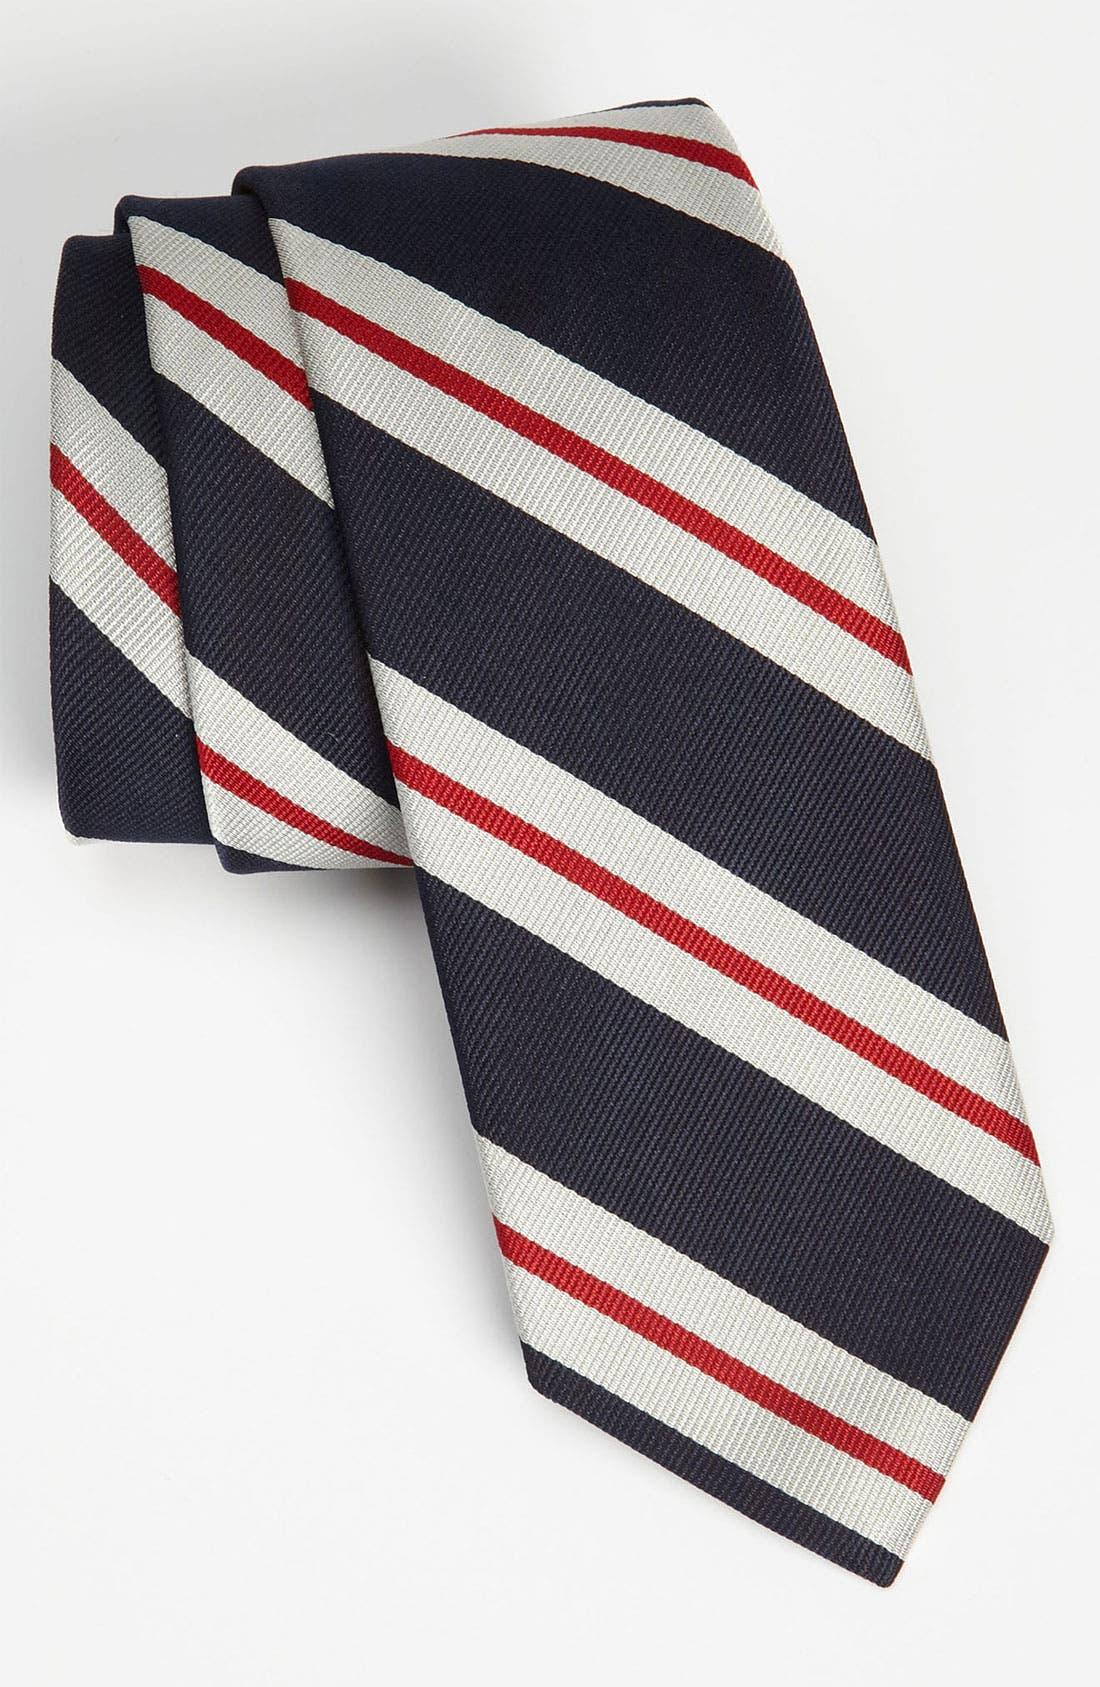 Alternate Image 1 Selected - Fahlgren Woven Silk Tie